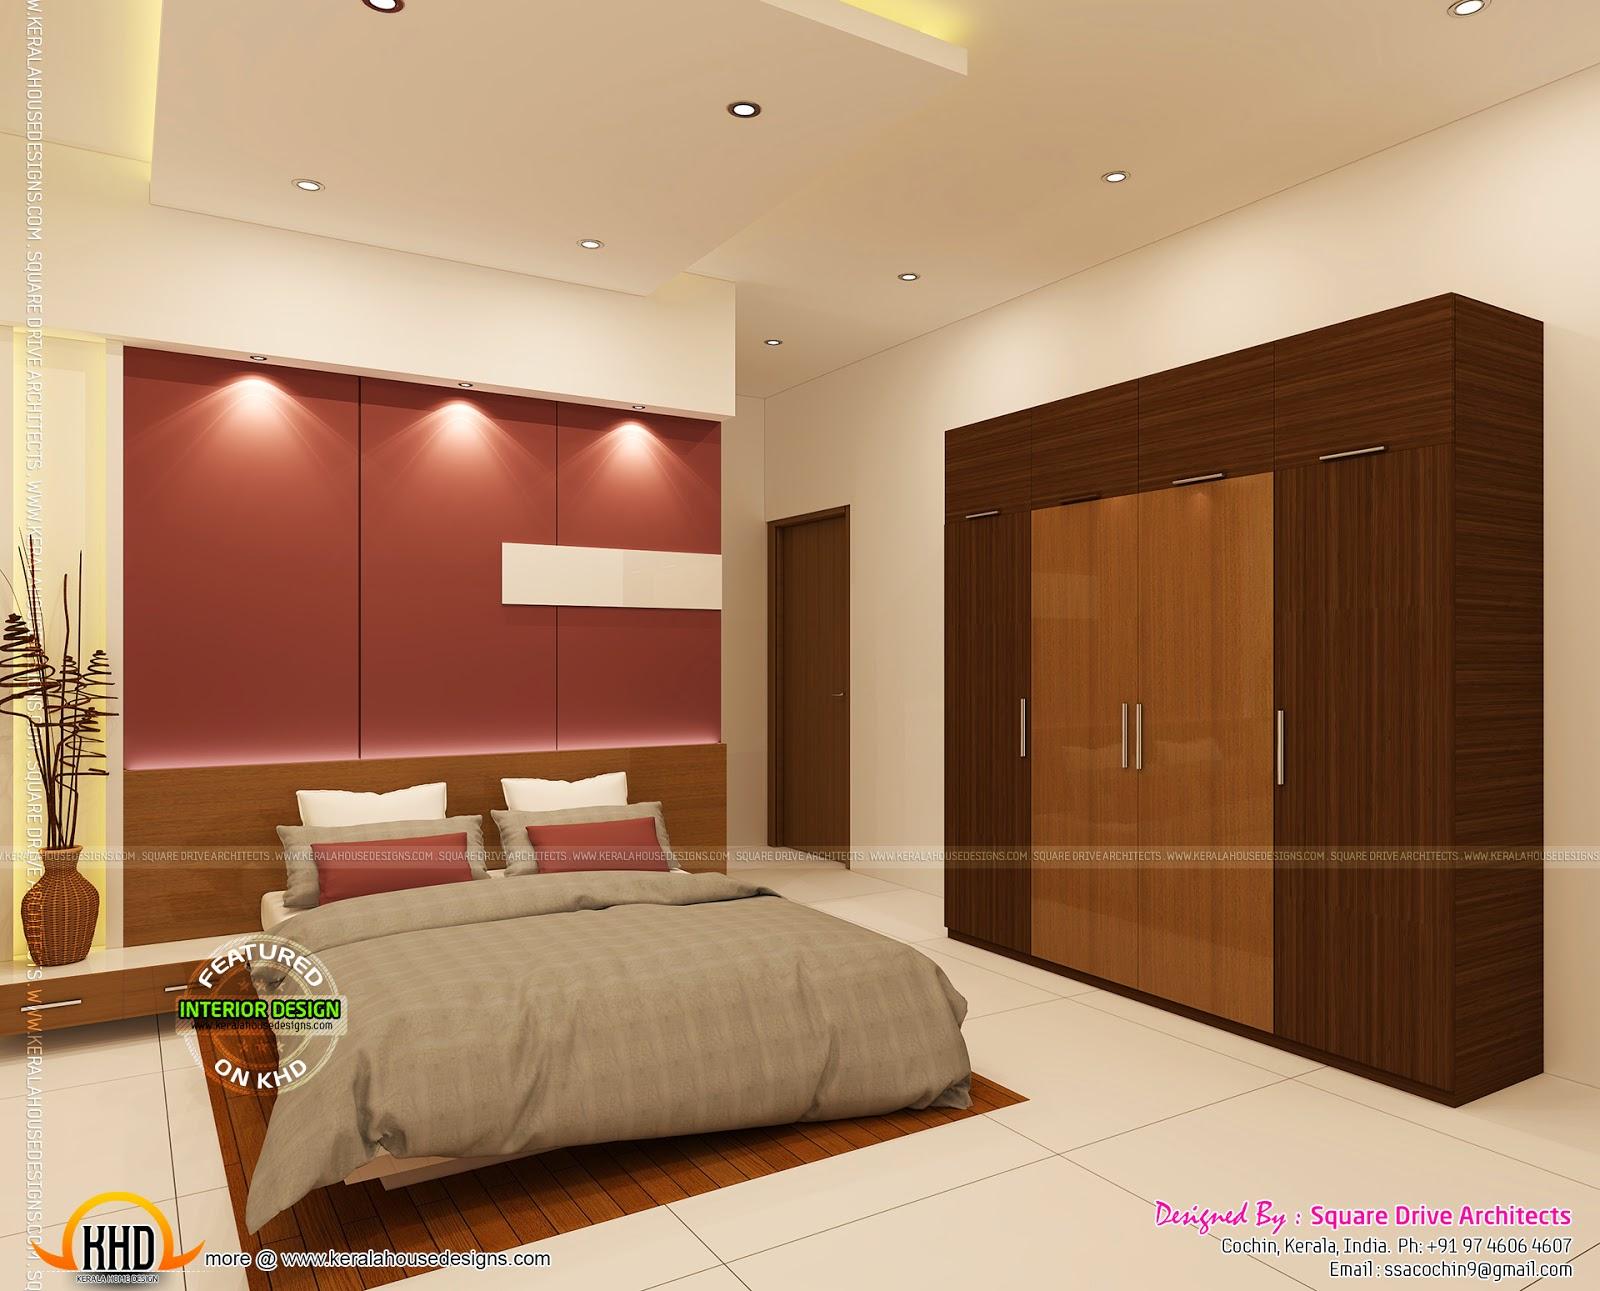 Home Interiors Designs